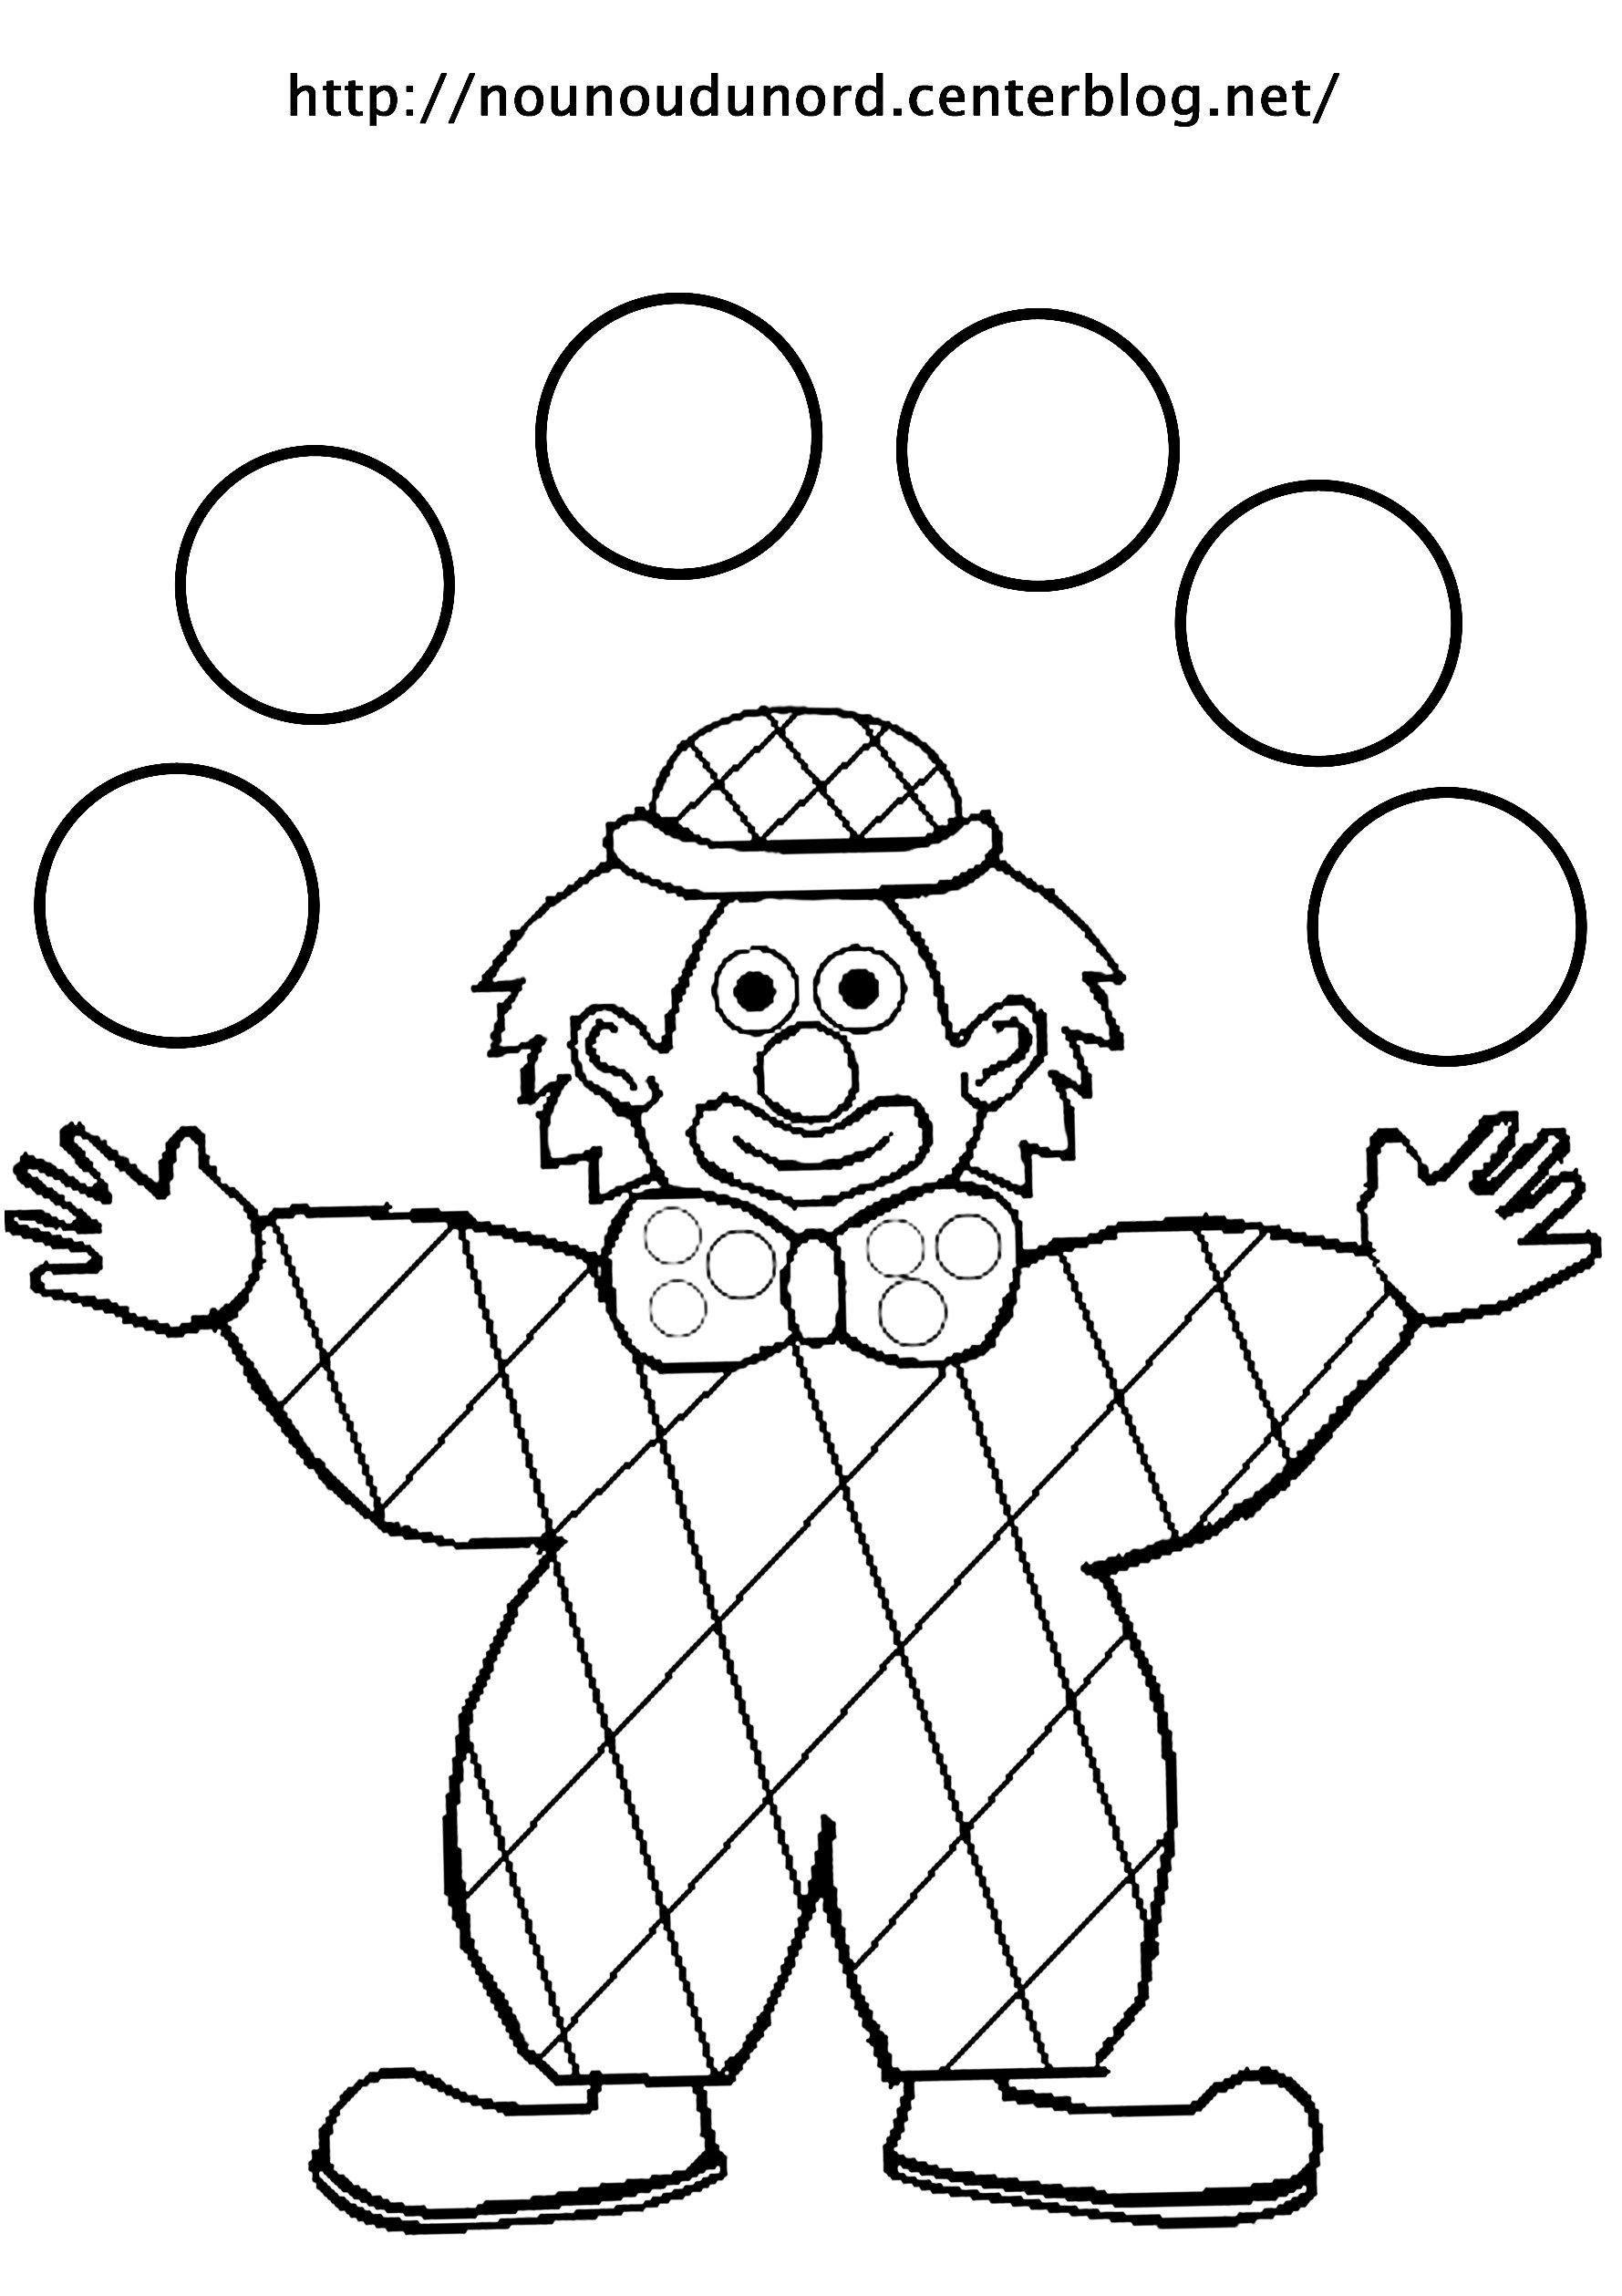 Coloriage Clown Garcon.Inspirant Coloriage Masque De Clown A Imprimer Meilleur Coloriage